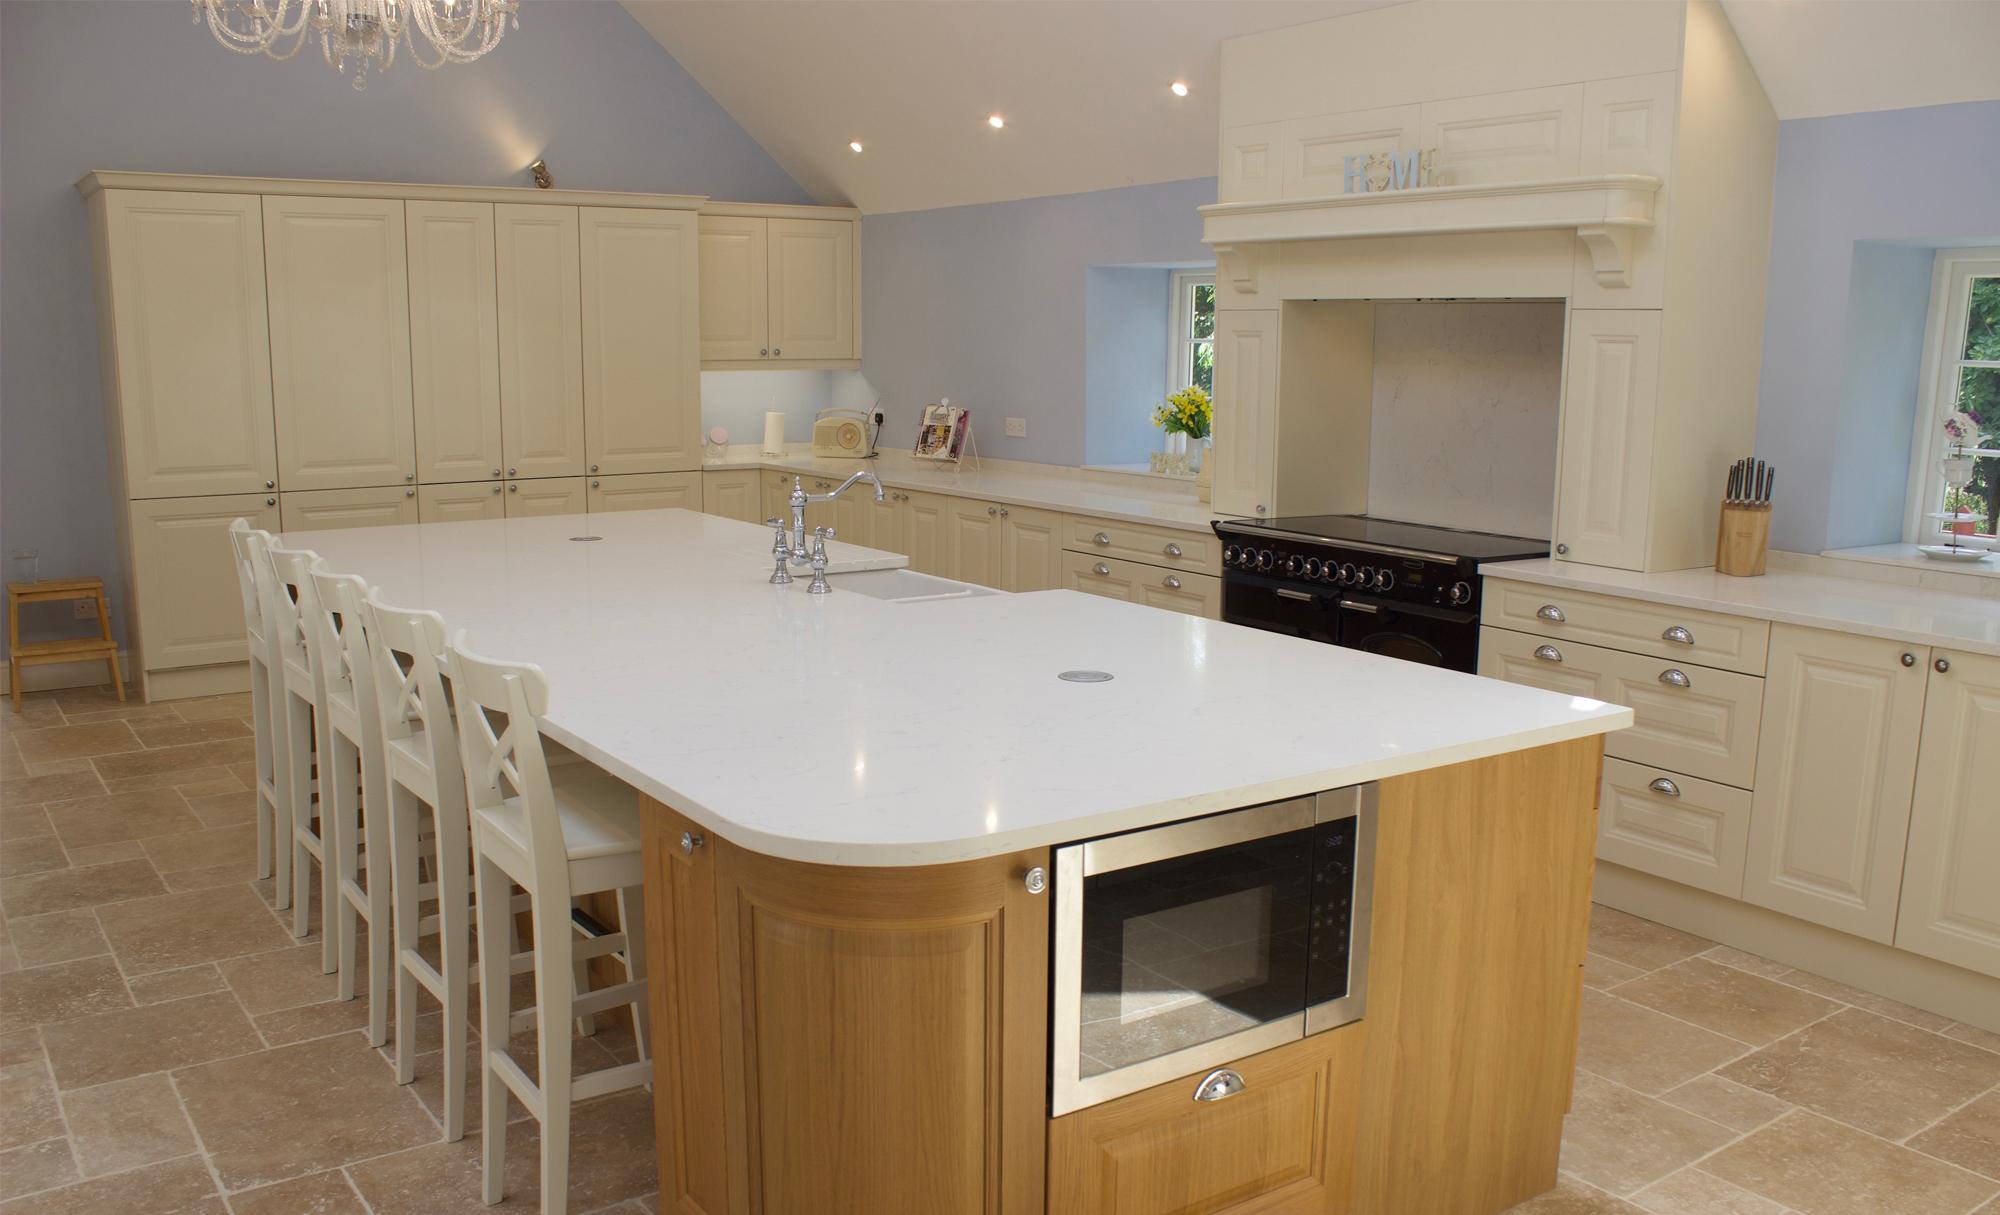 Huntersbrook Jefferson Oak & Ivory Kitchen for Mr & Mrs Hamill of Harlow